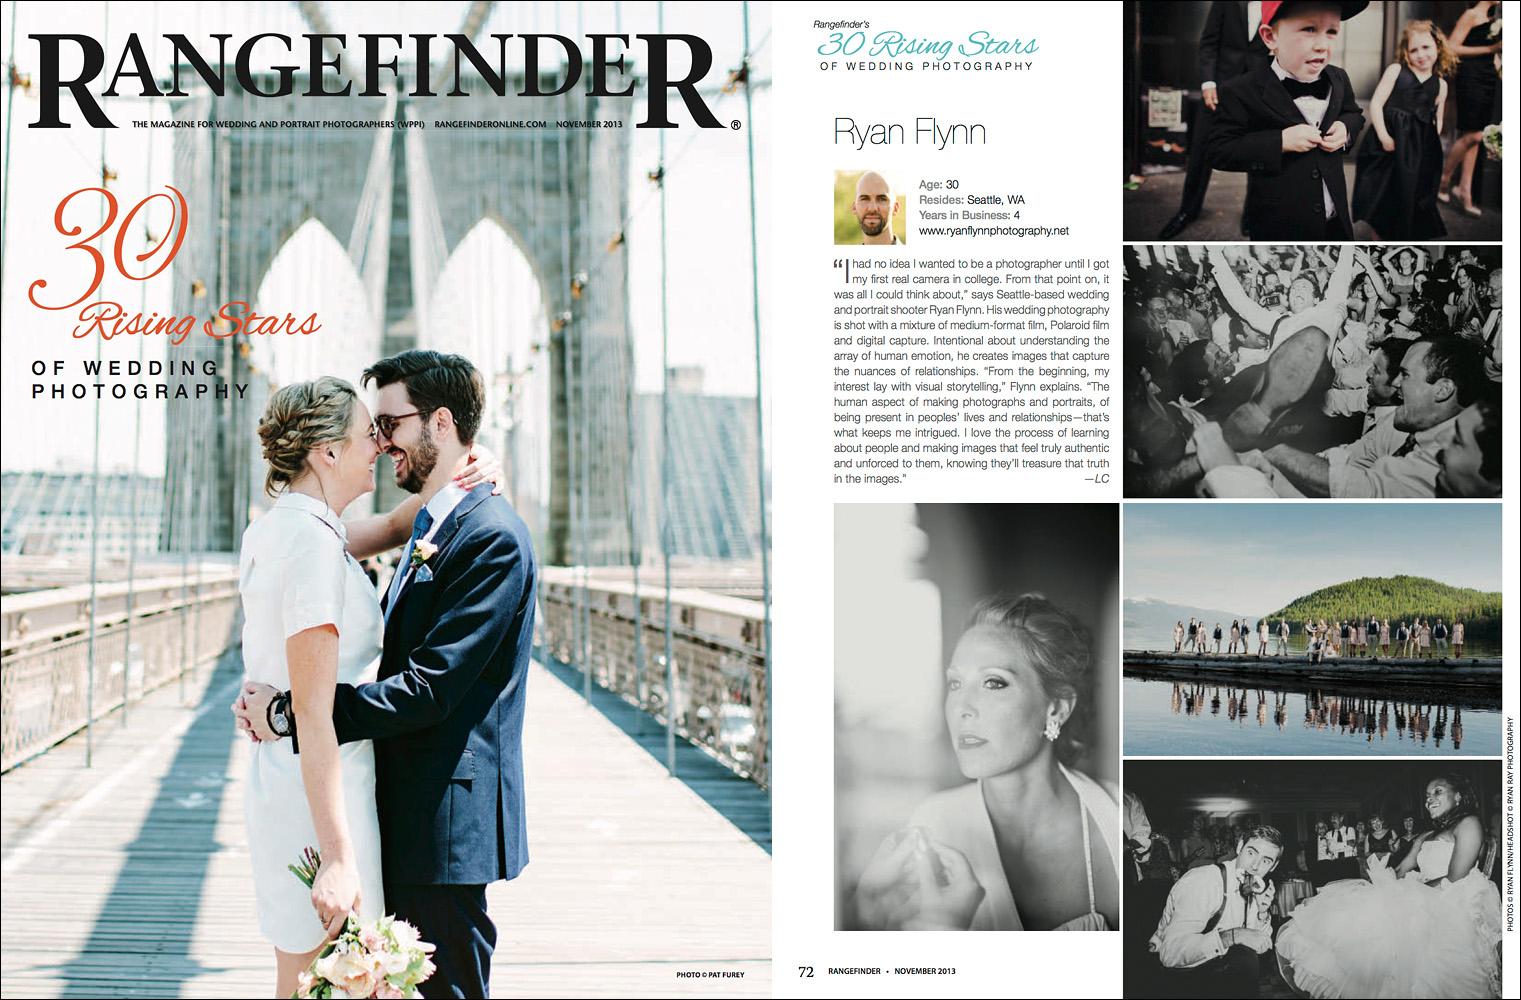 rangefinder-magazine-30-rising-stars-of-wedding-photography-ryan-flynn-2.jpg